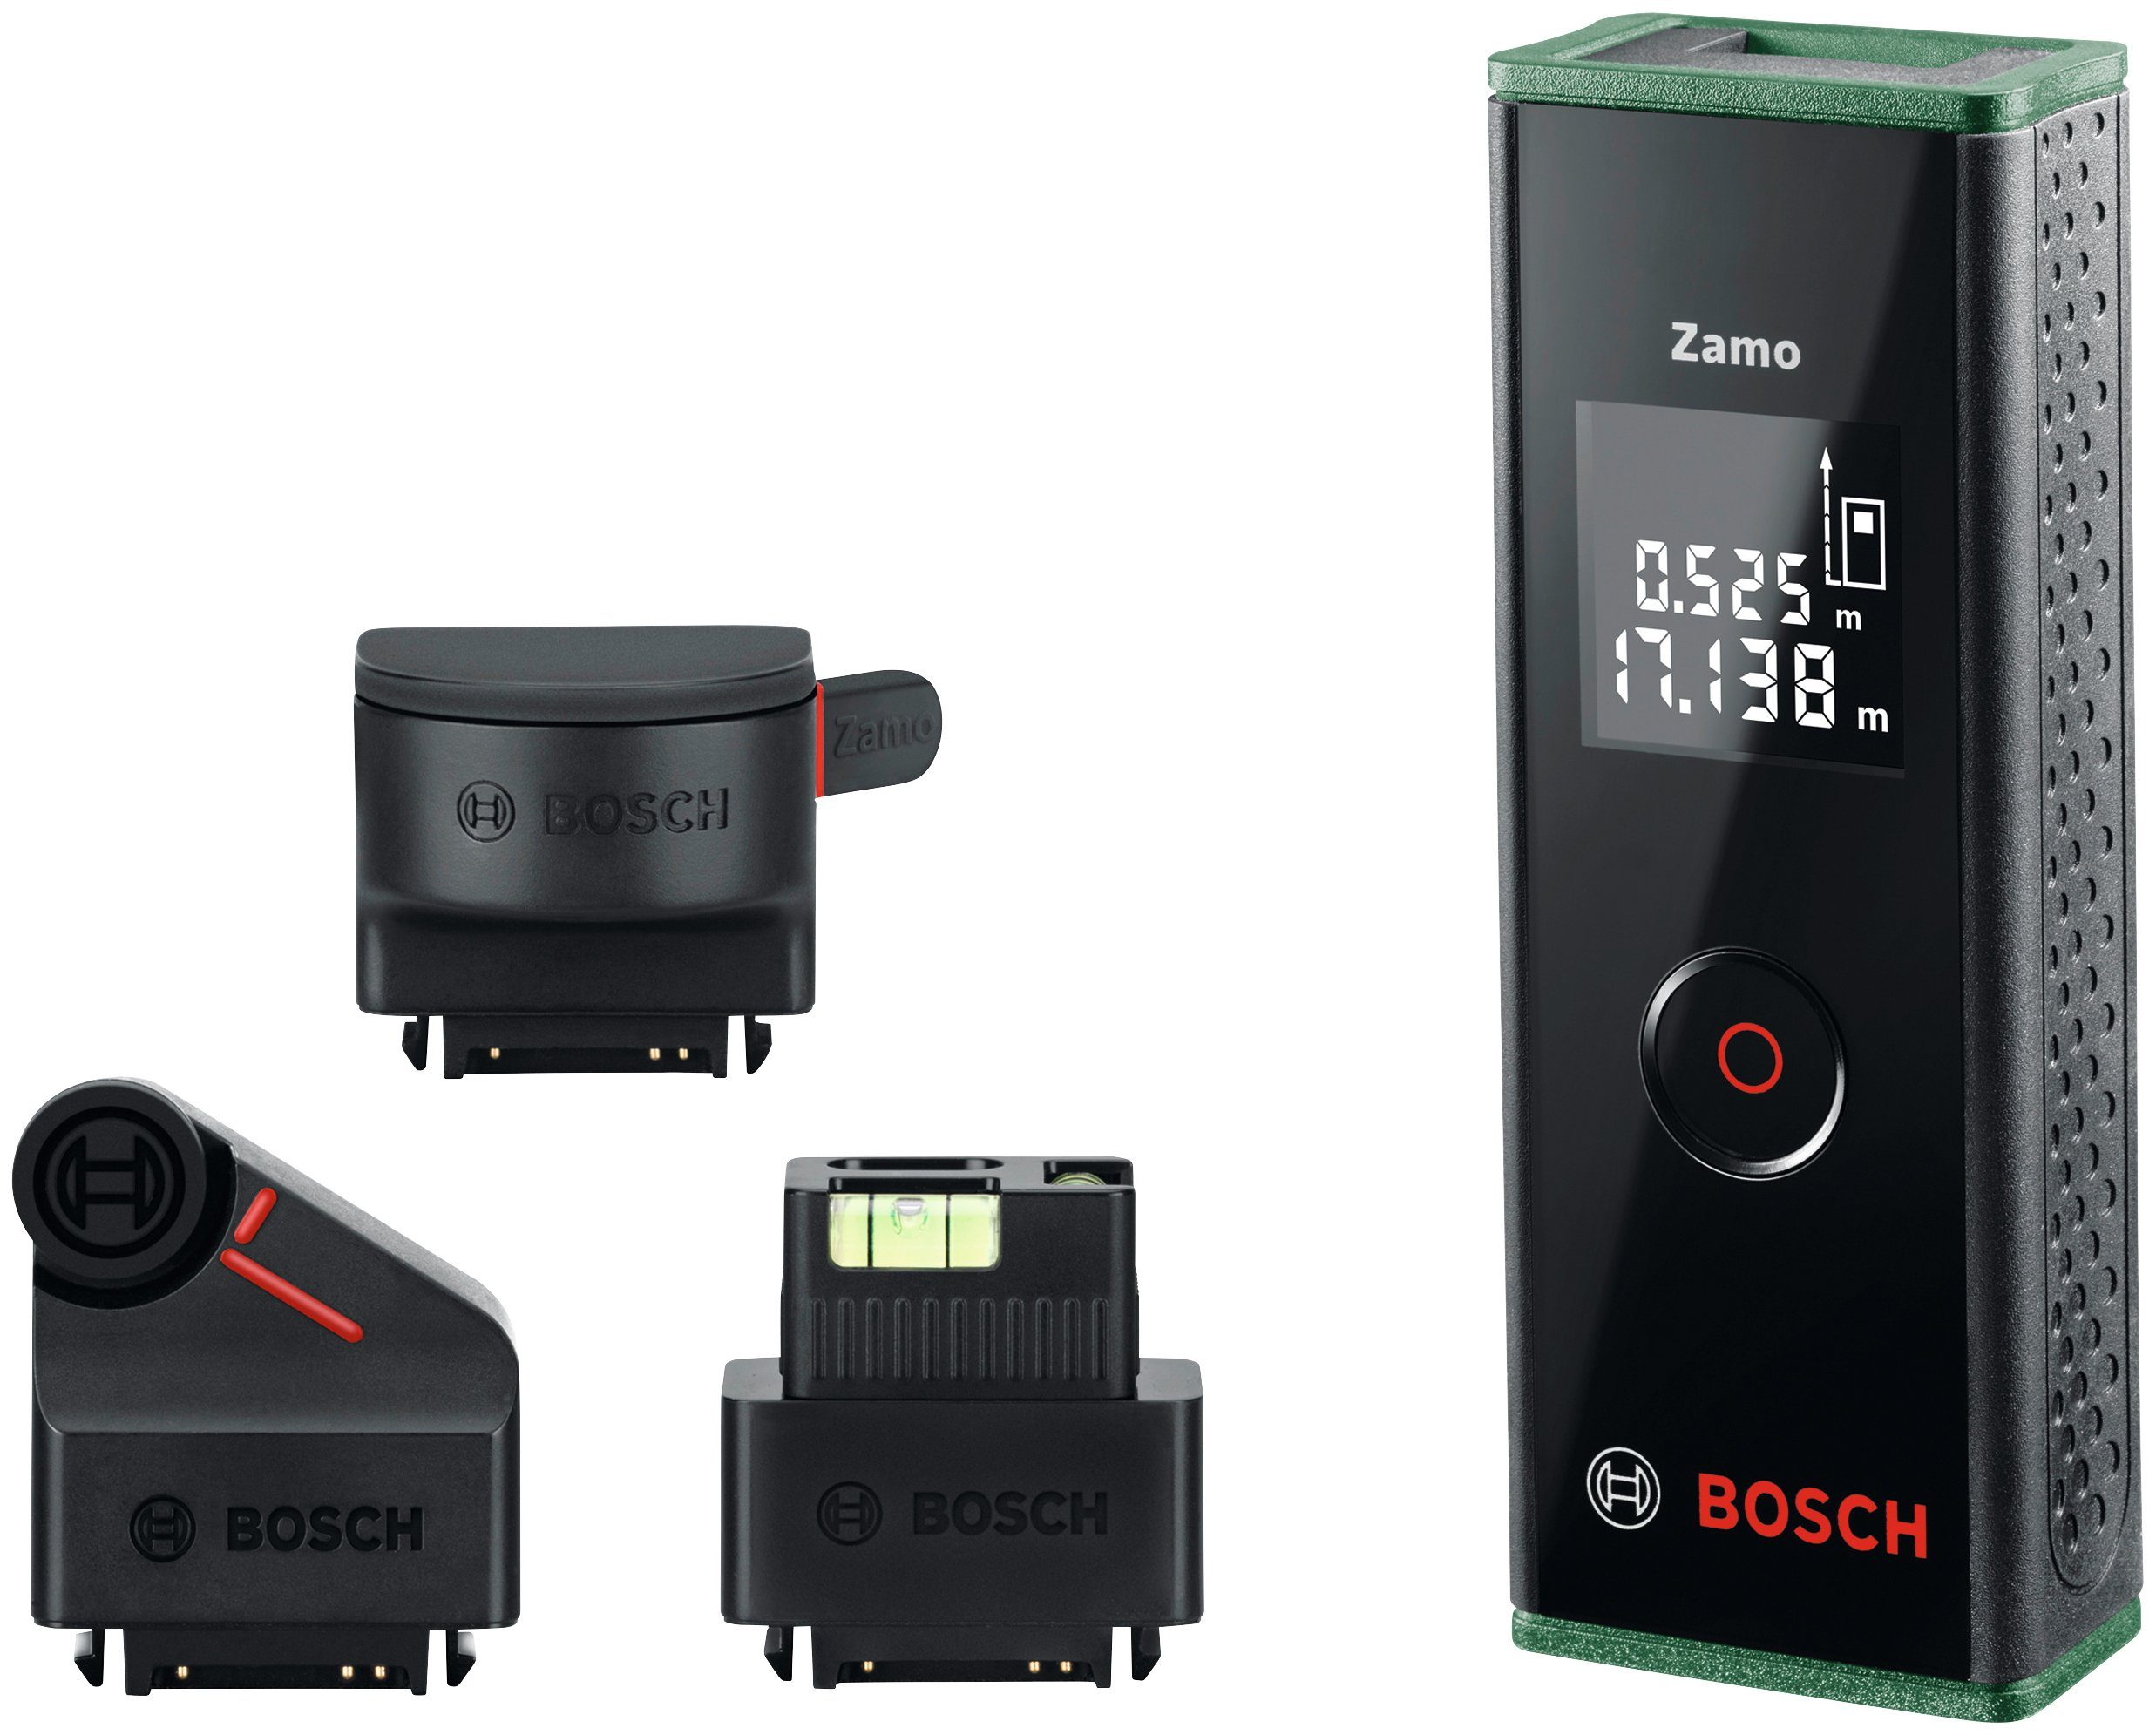 Bosch set entfernungsmesser zamo iii« laser otto